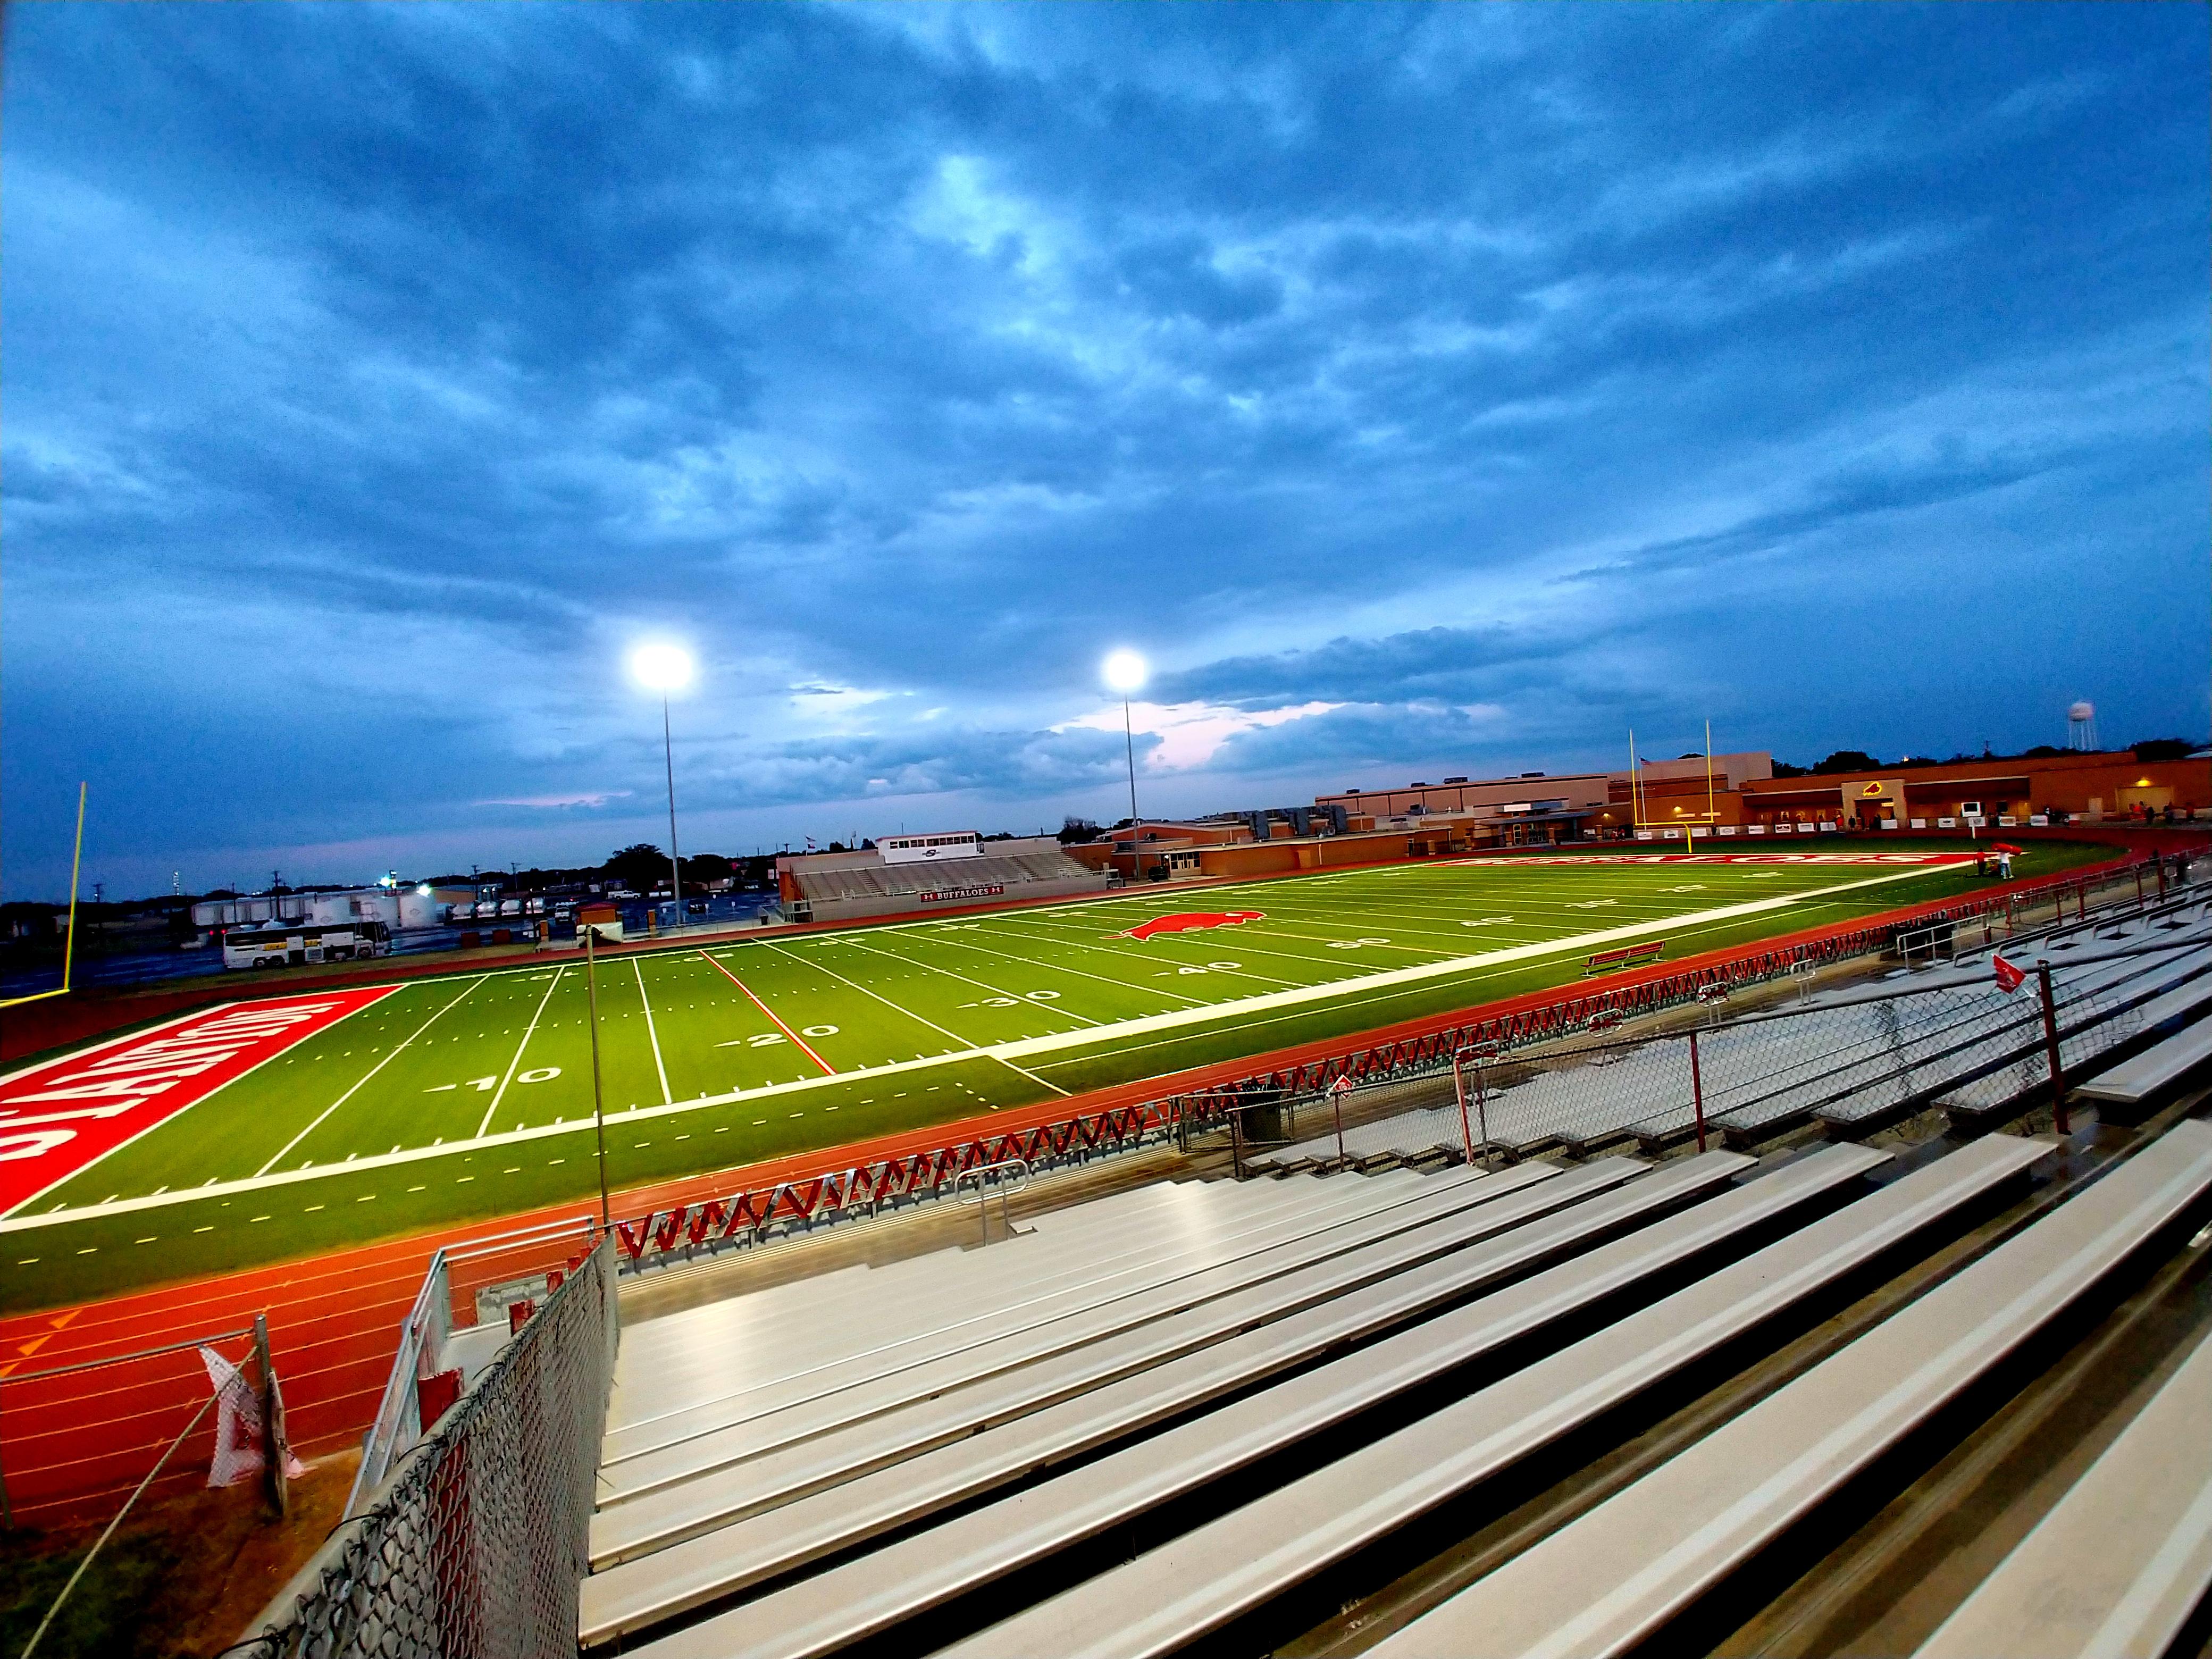 Stanton High Football Field